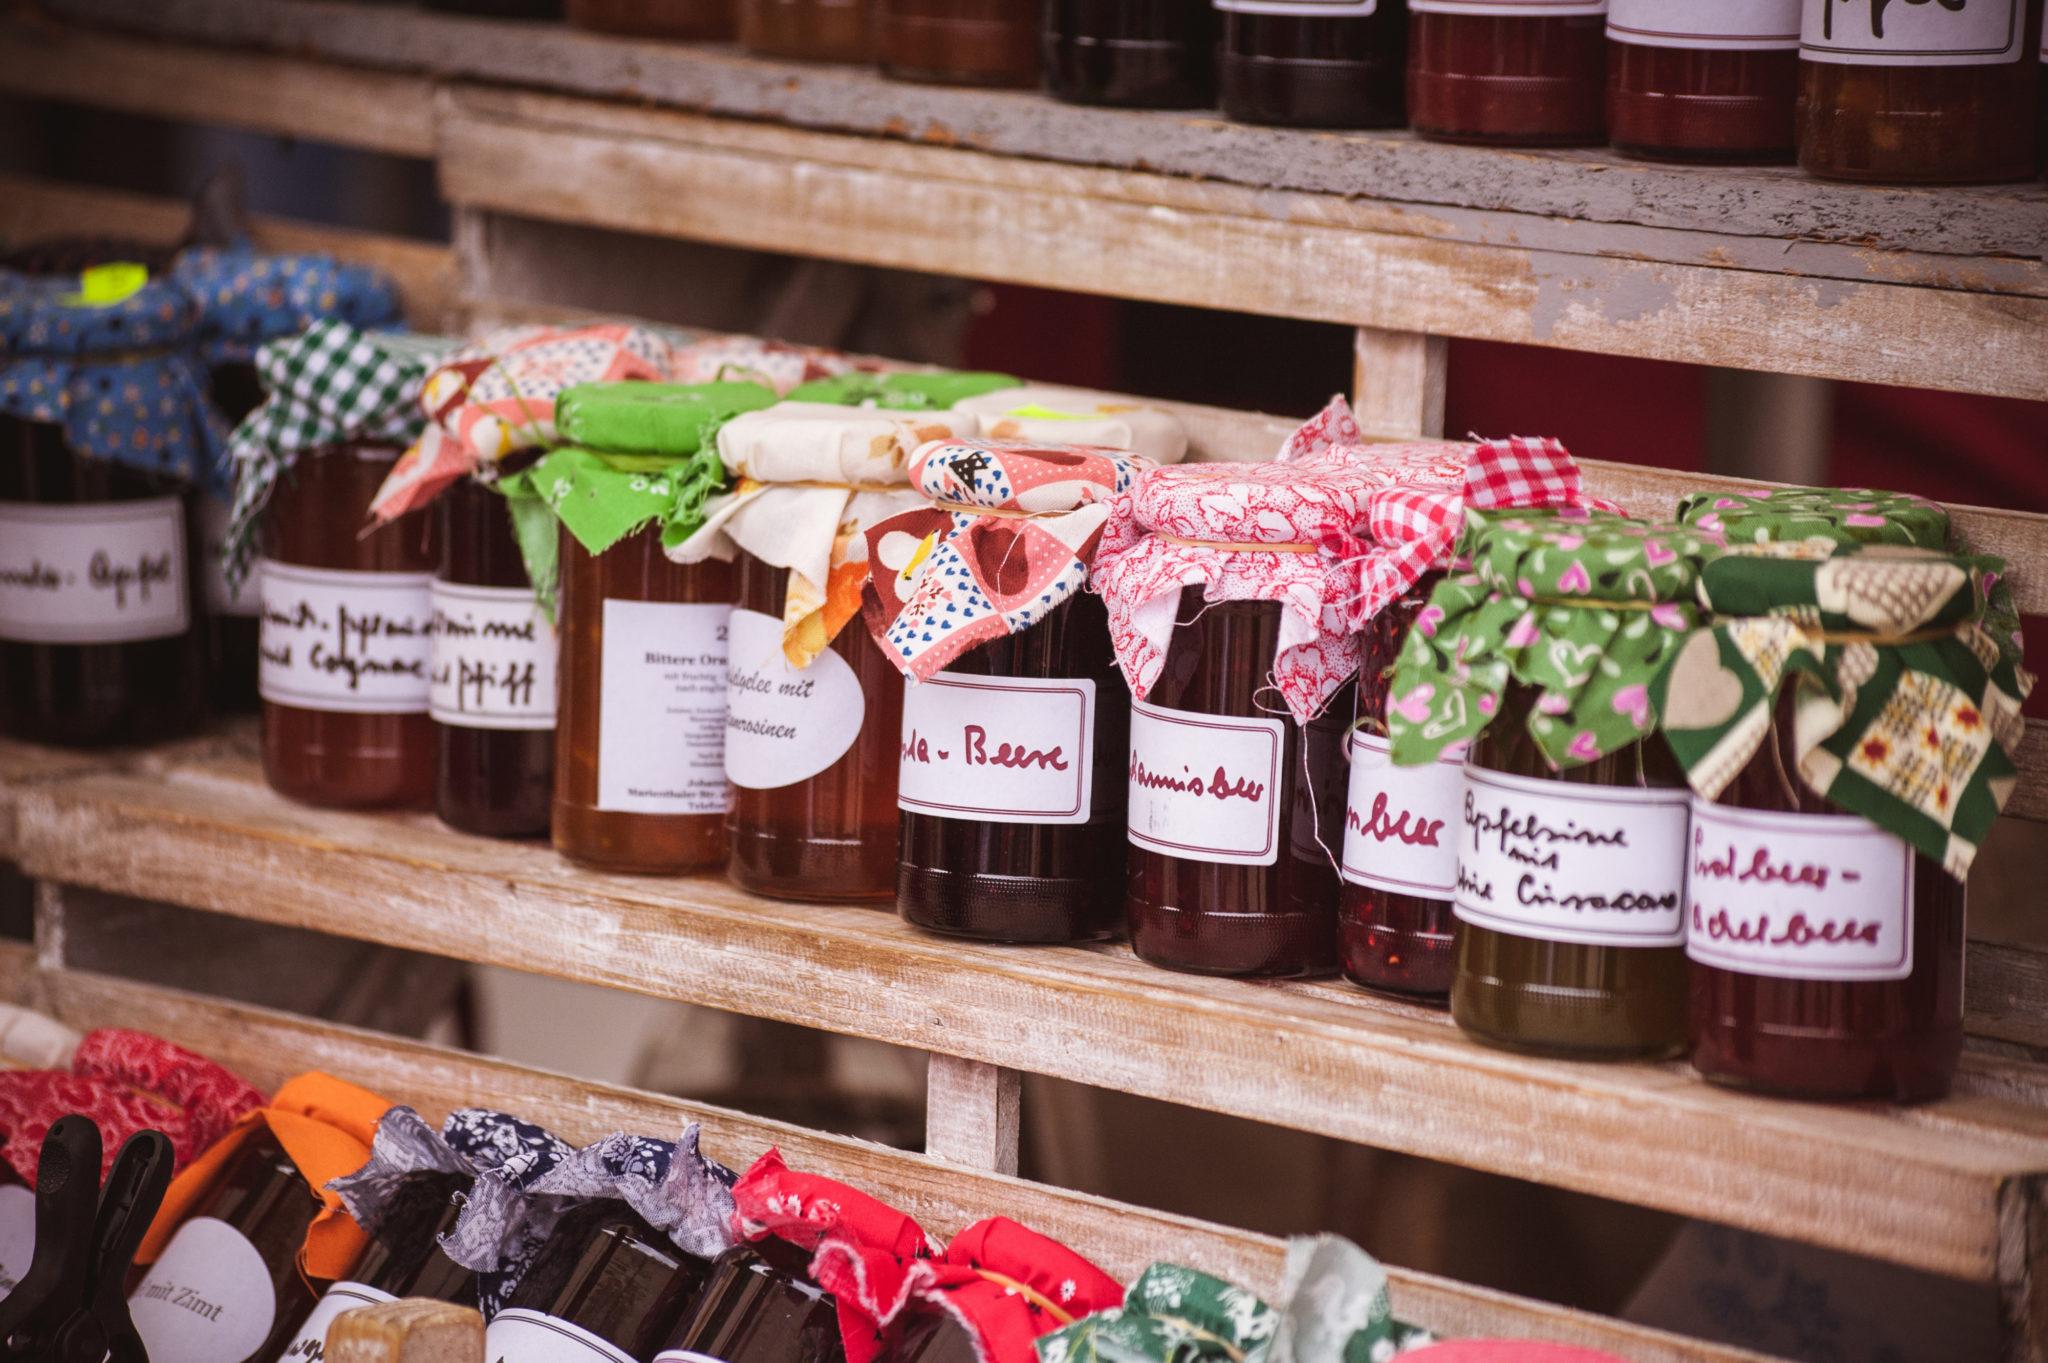 Farmers market product display